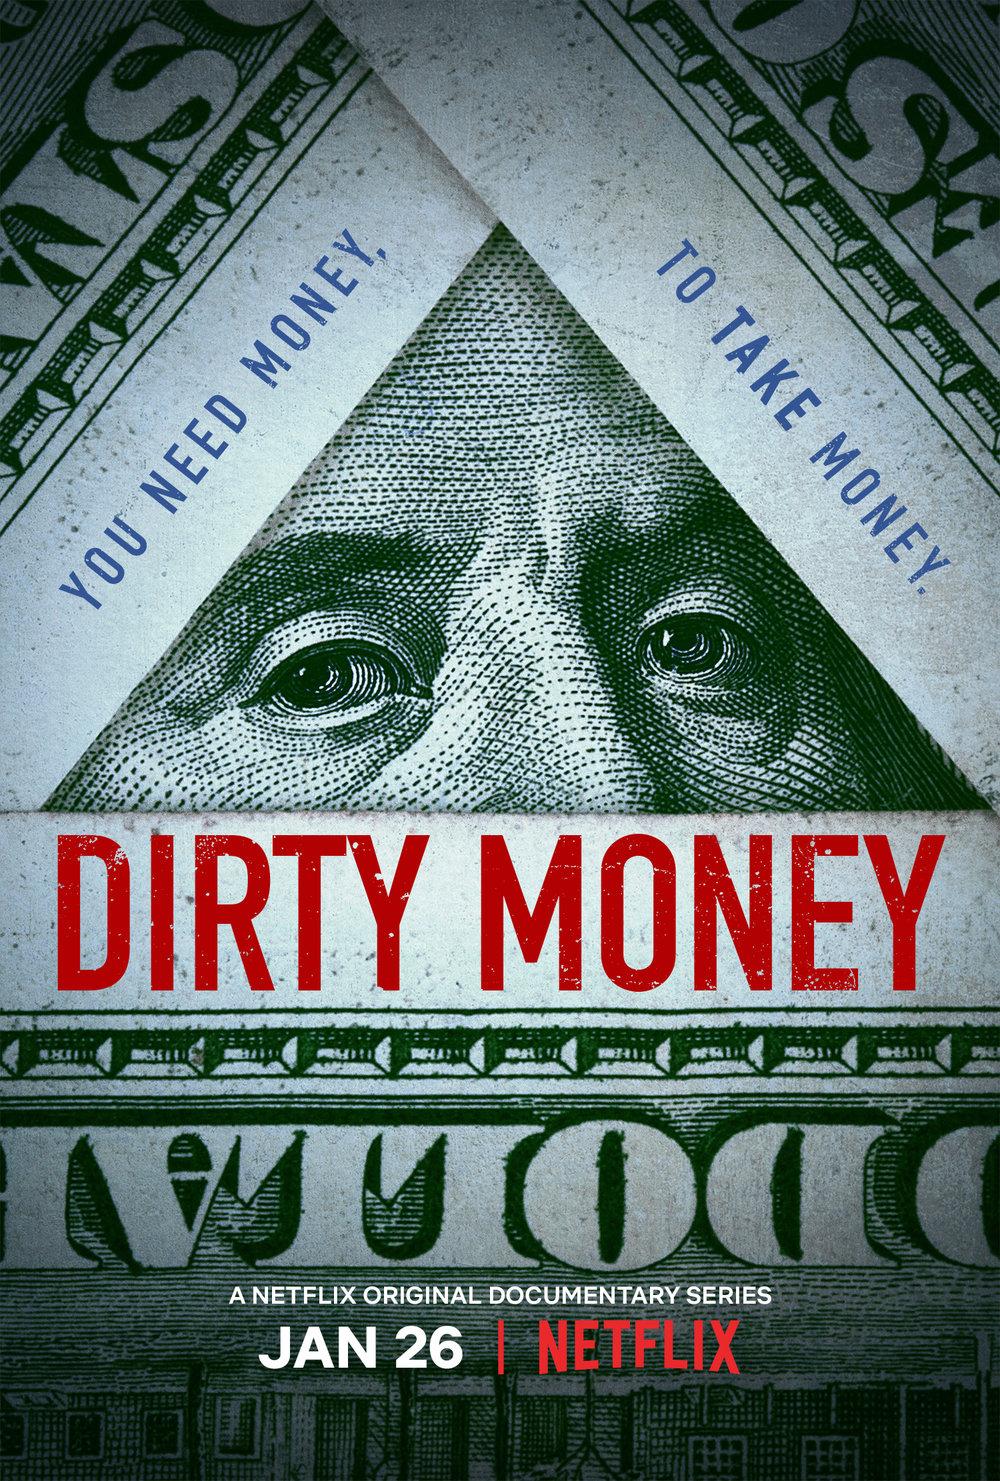 """Dirty Money: Drug Short"" - Netflix, Season 1, Episode 3 (2018)"